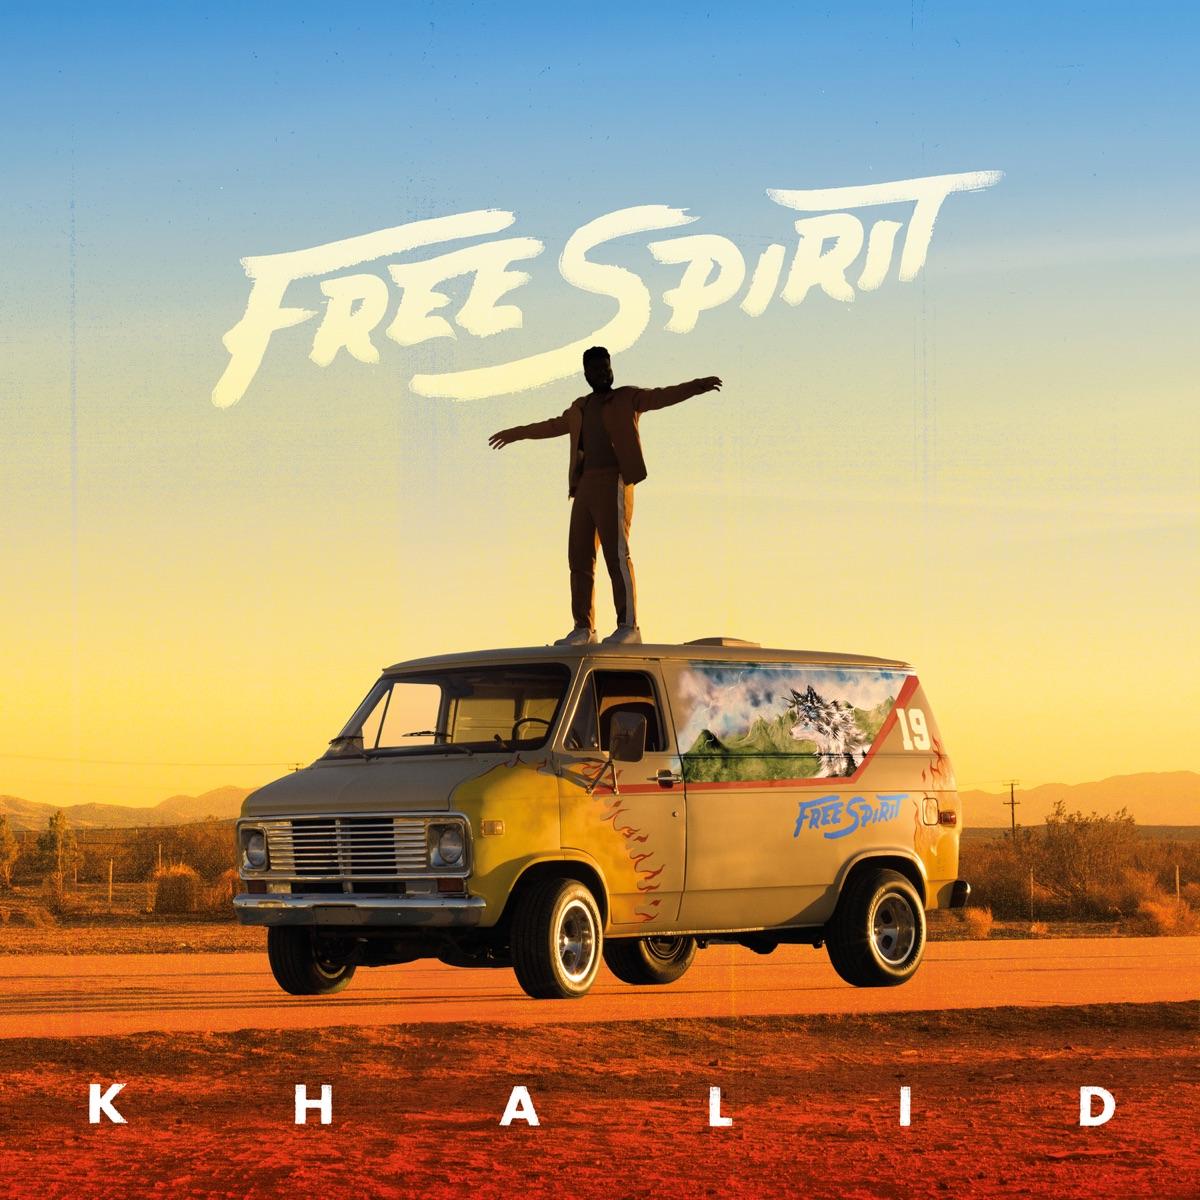 Free Spirit Khalid CD cover